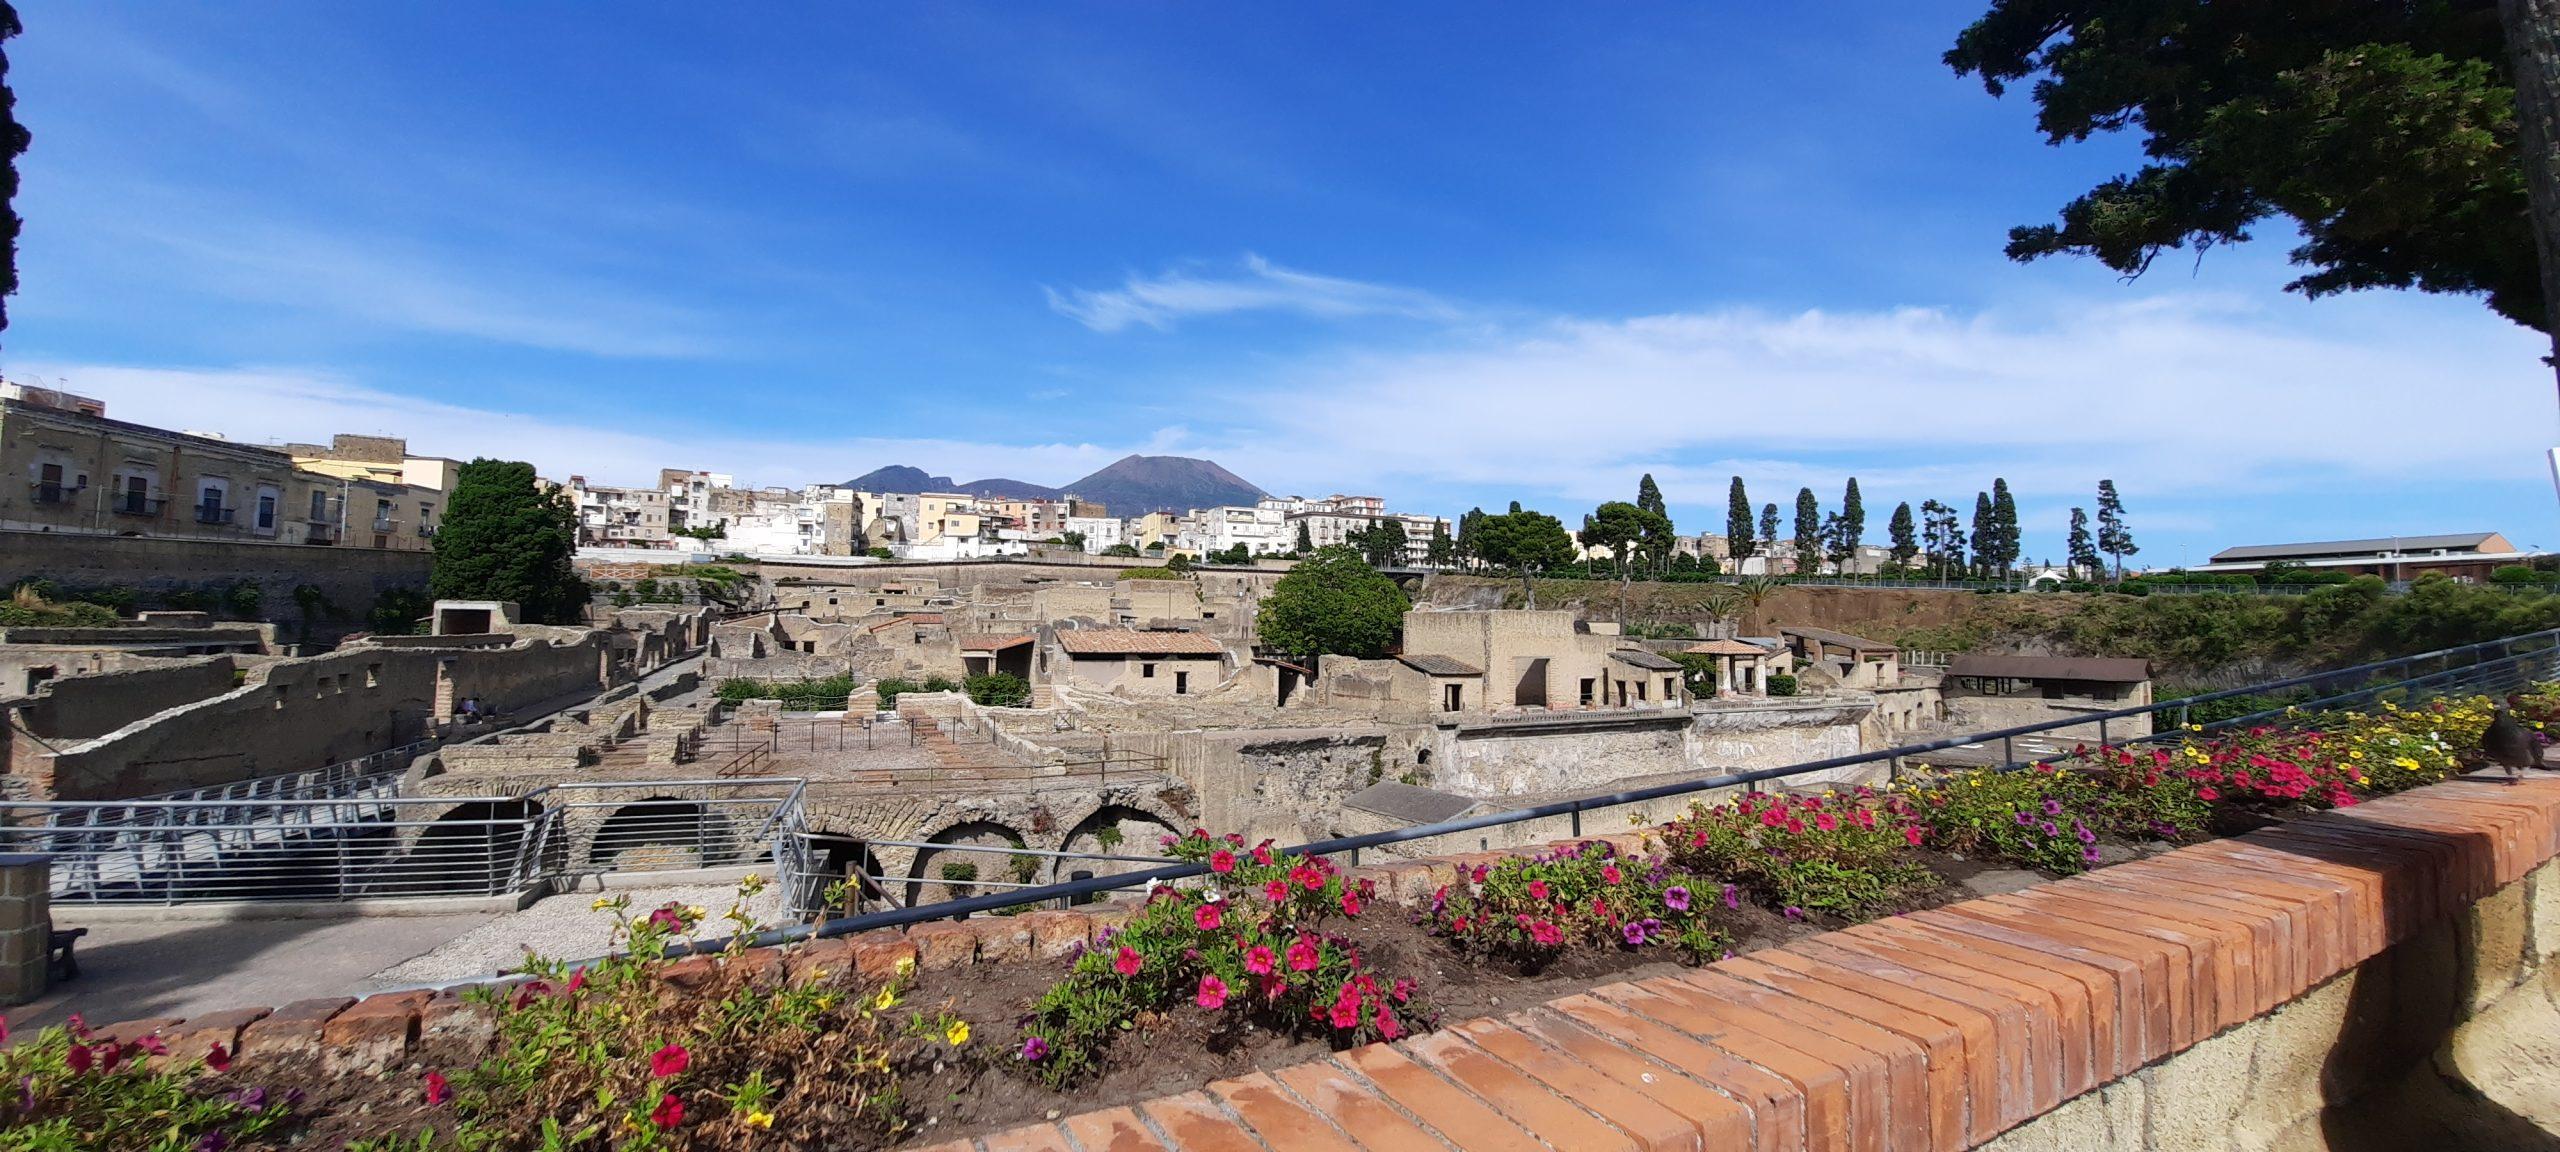 Herculaneum Italy